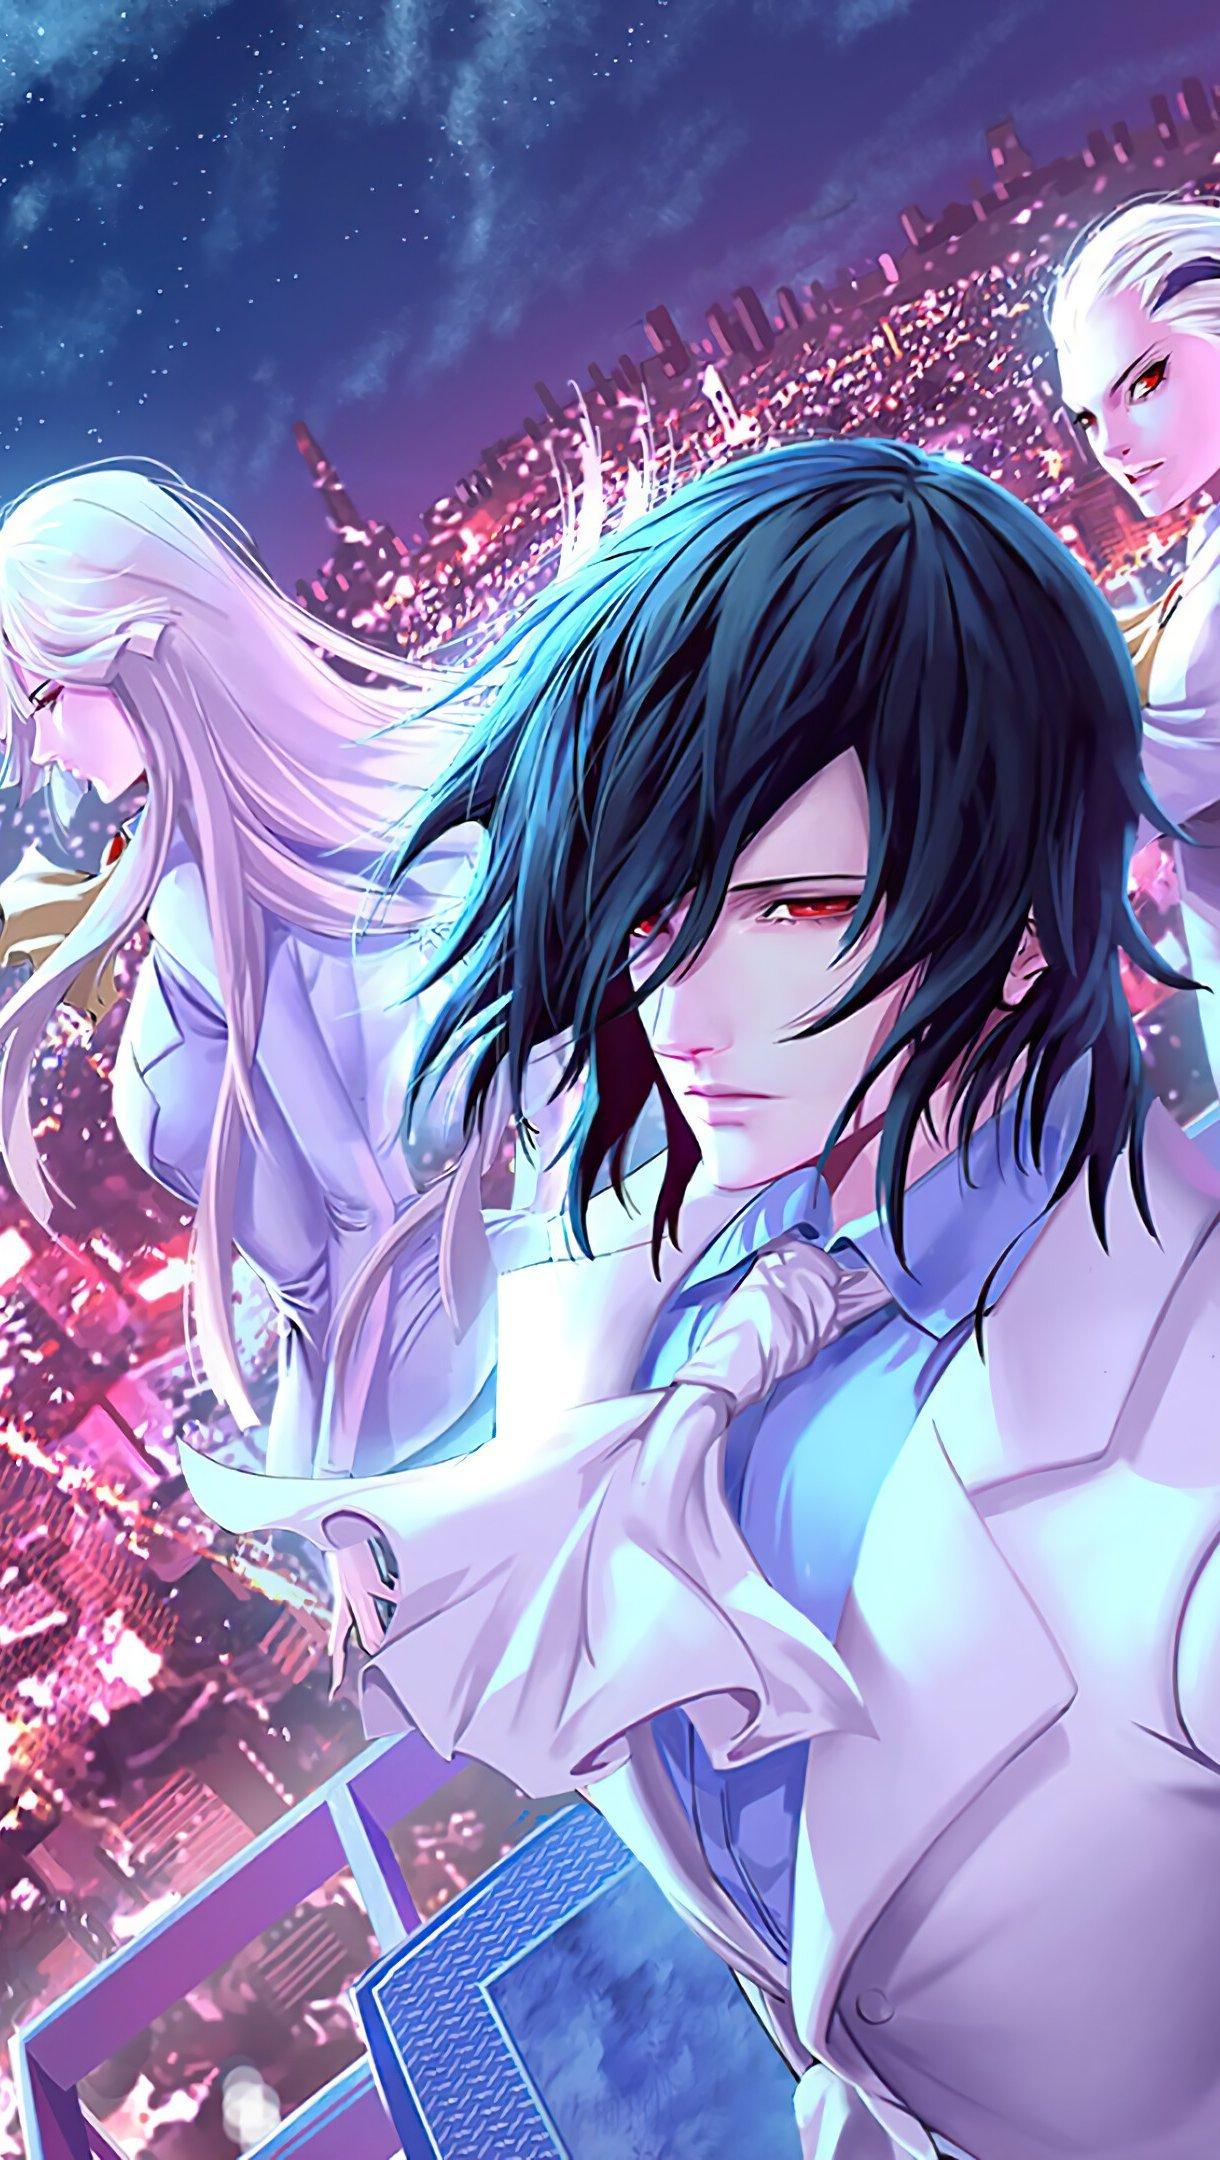 Fondos de pantalla Anime Personajes de Noblesse Vertical